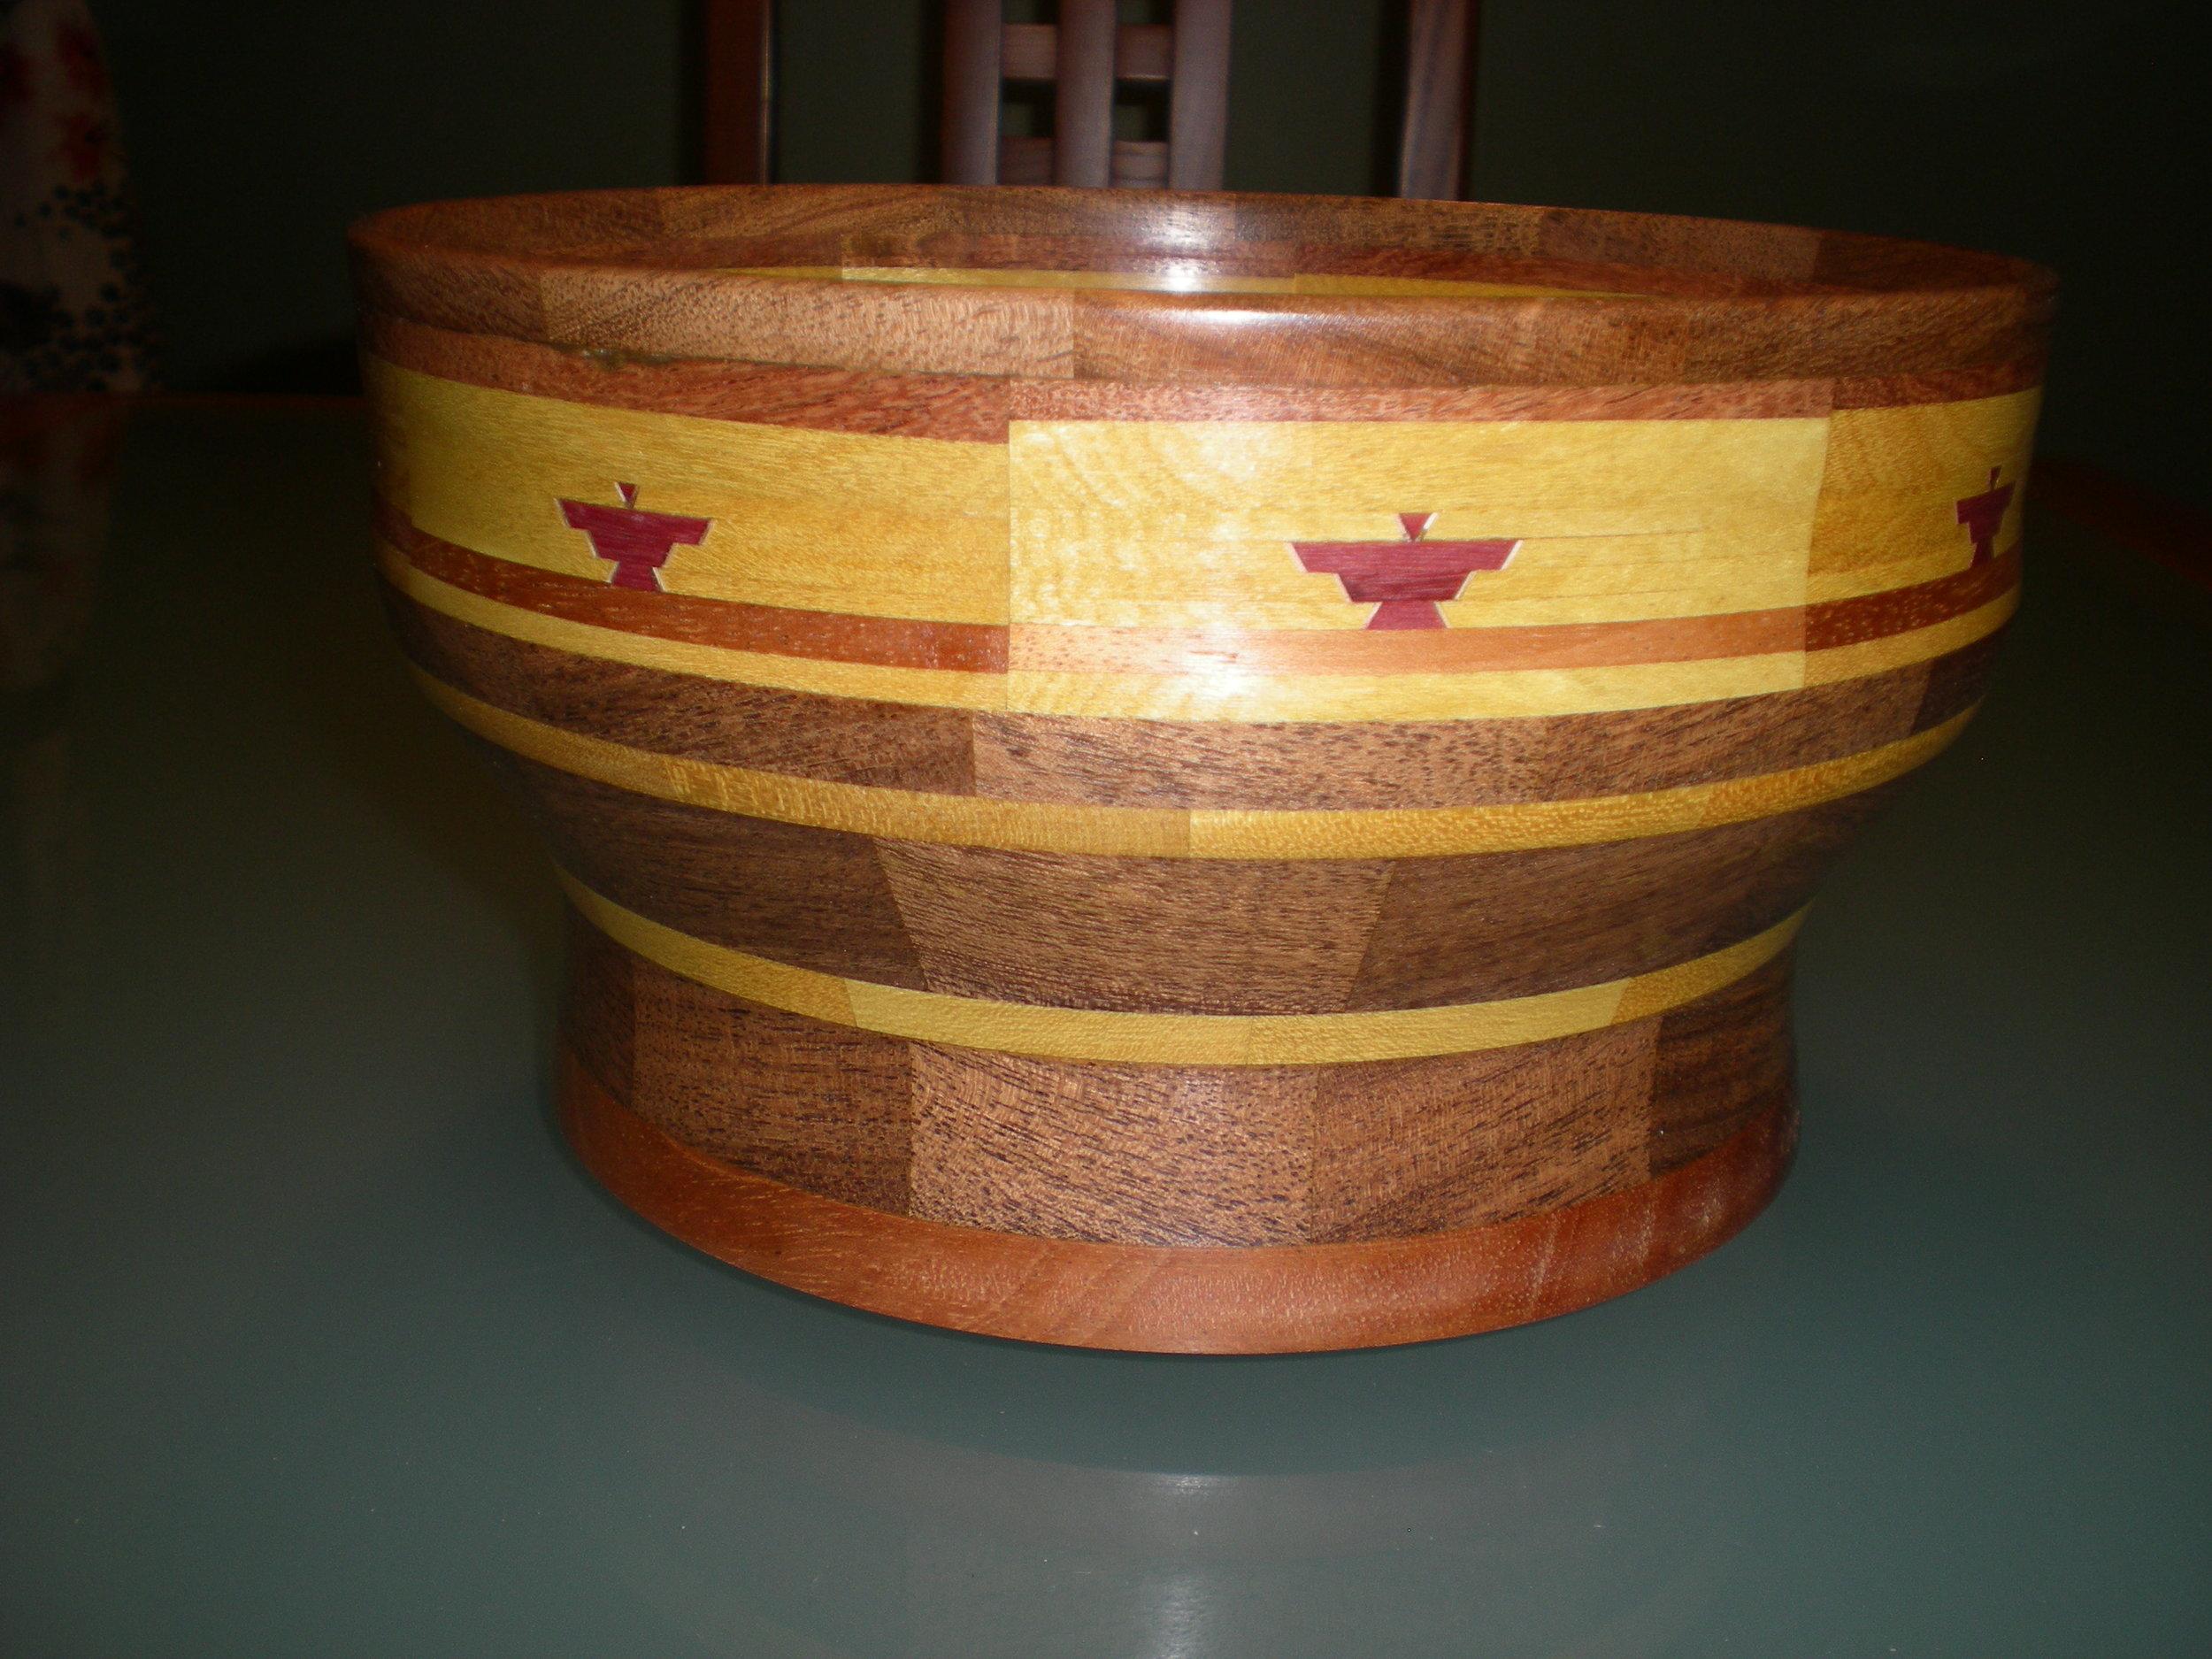 RJC Wood Creations - Bowls (33).JPG